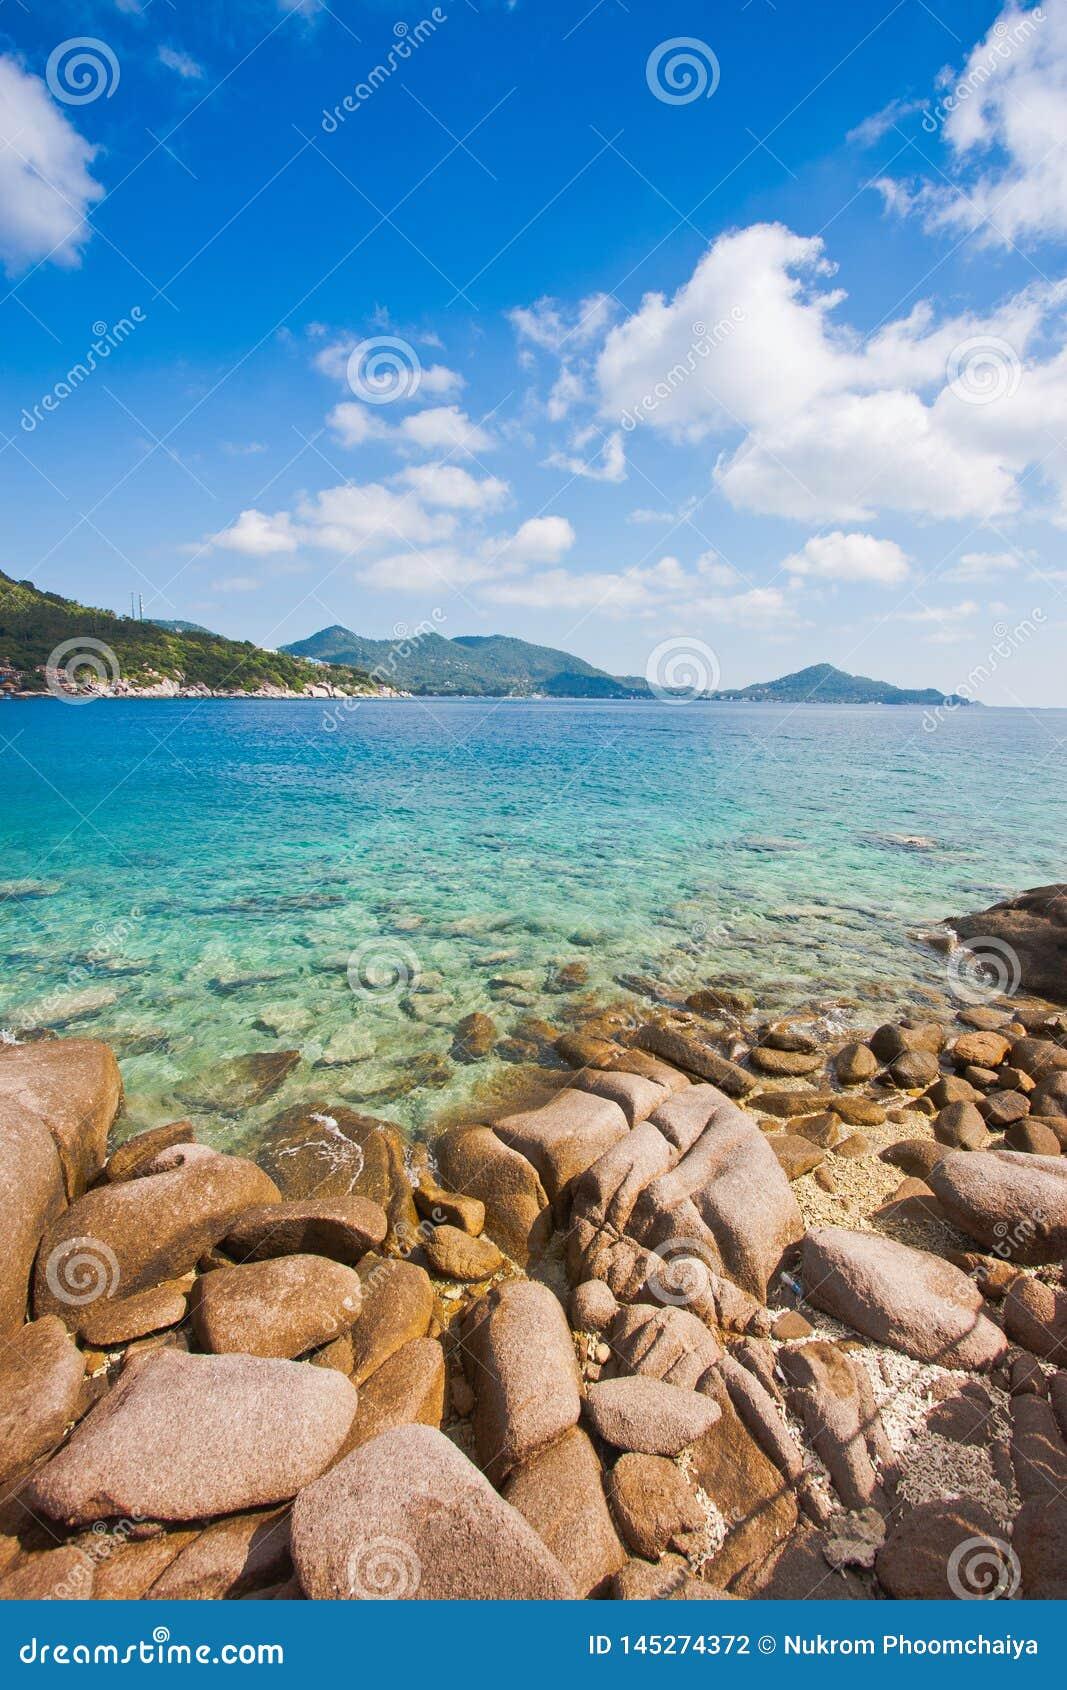 Koh το νησί tao είναι δημοφιλής εξωτικός τουρισμός για το σκάφανδρο κίνησης με ένα όμορφο υπόβαθρο τοπίων φύσης